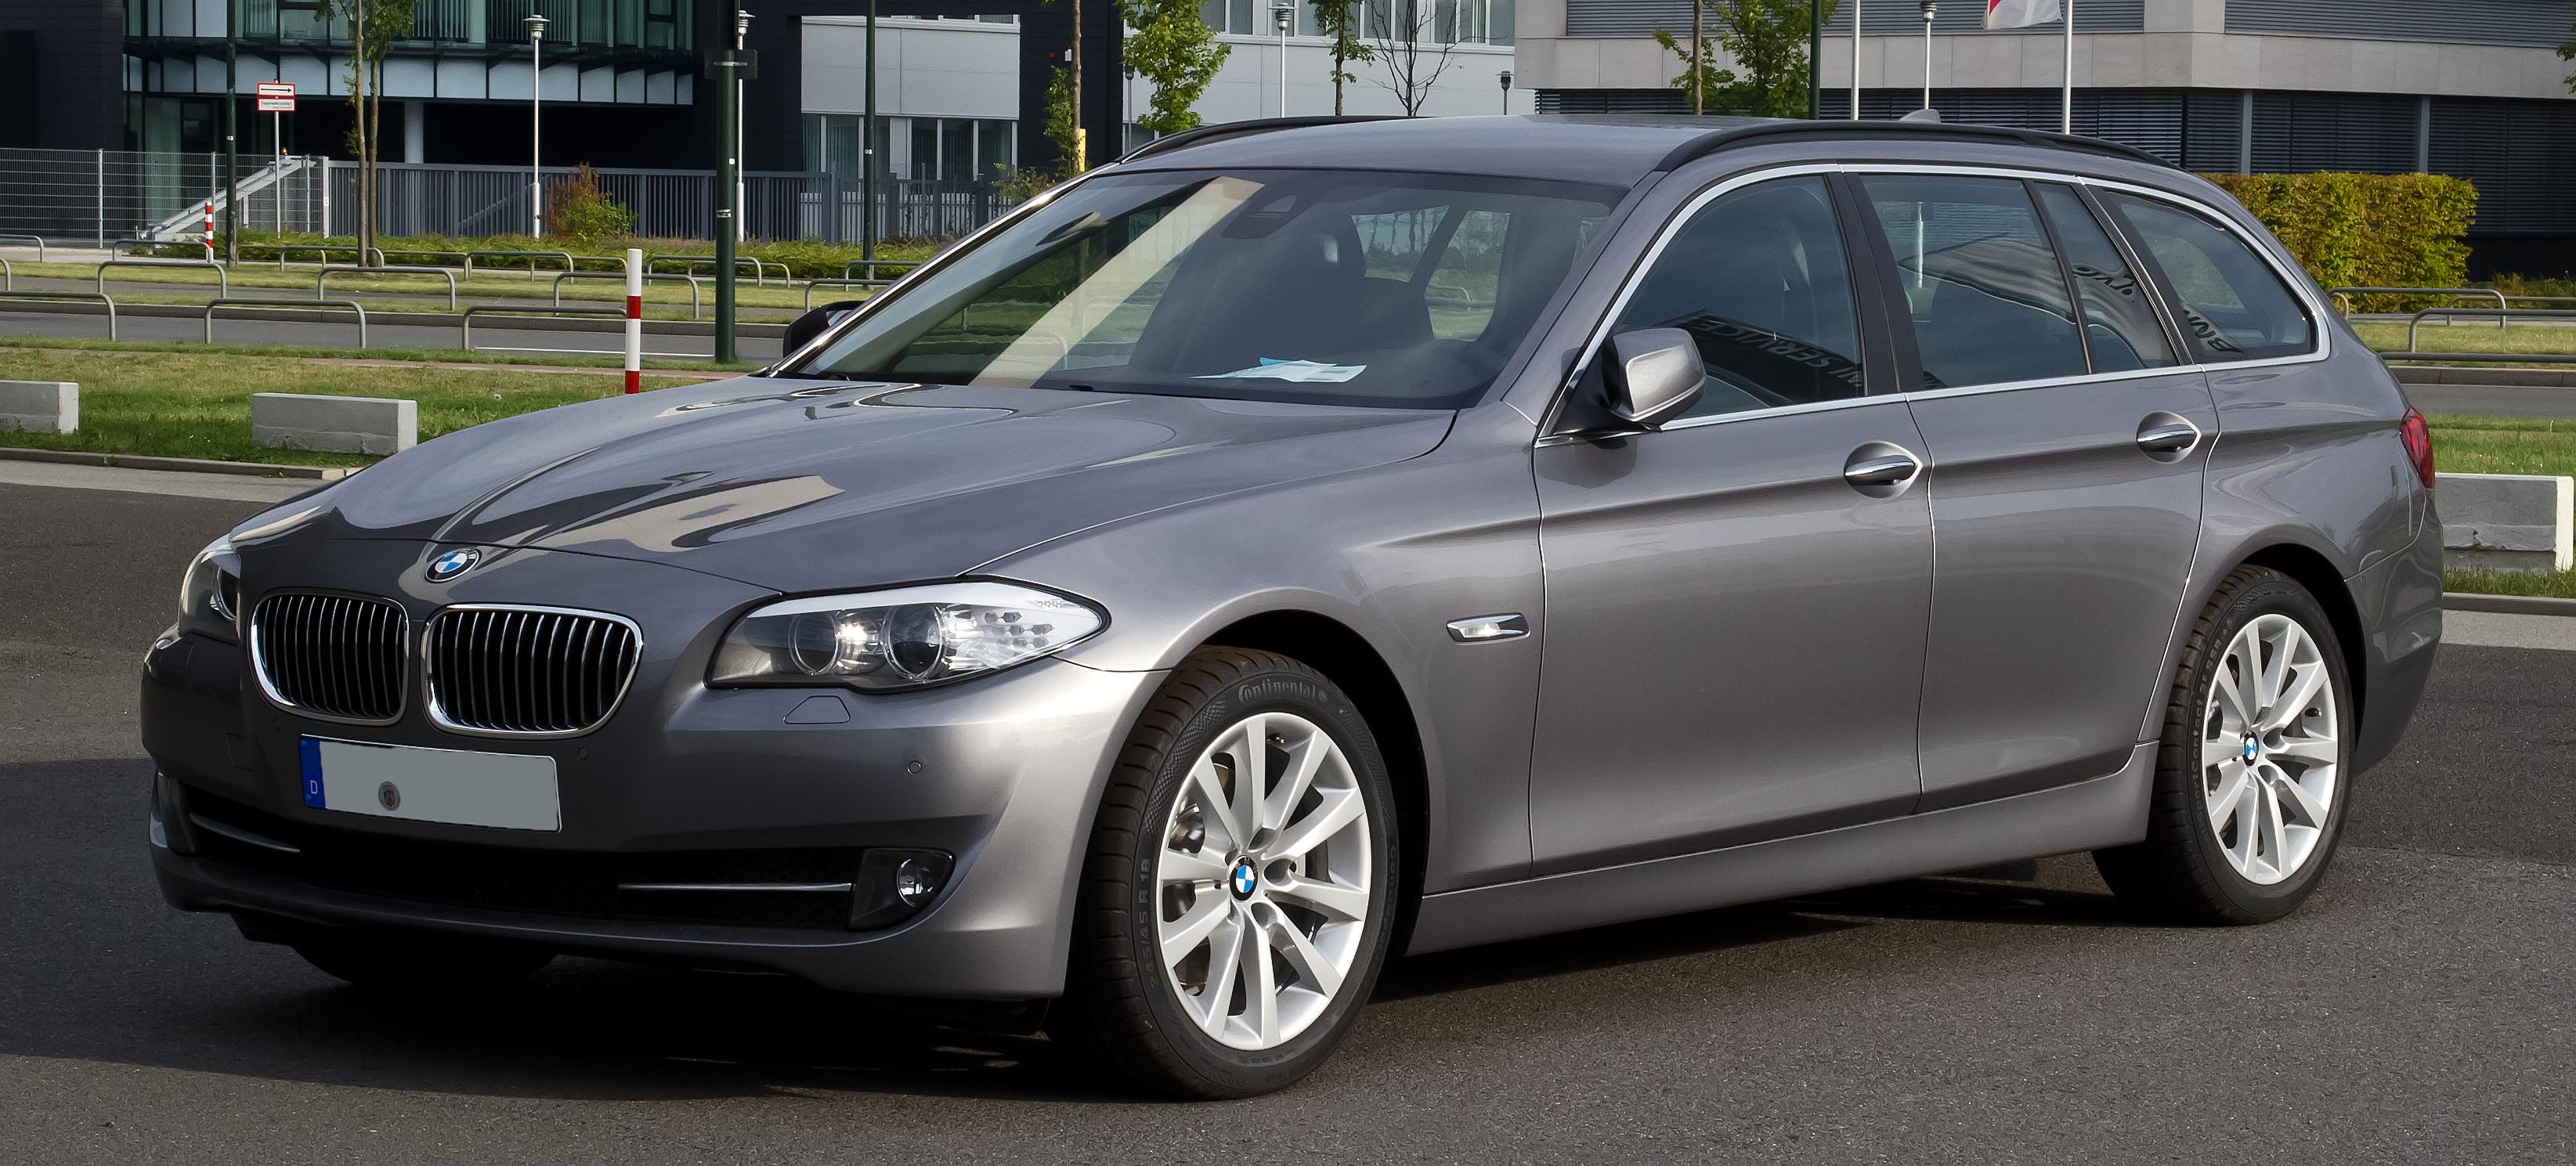 File:BMW 5er Touring (F11) – Frontansicht, 2. September ...